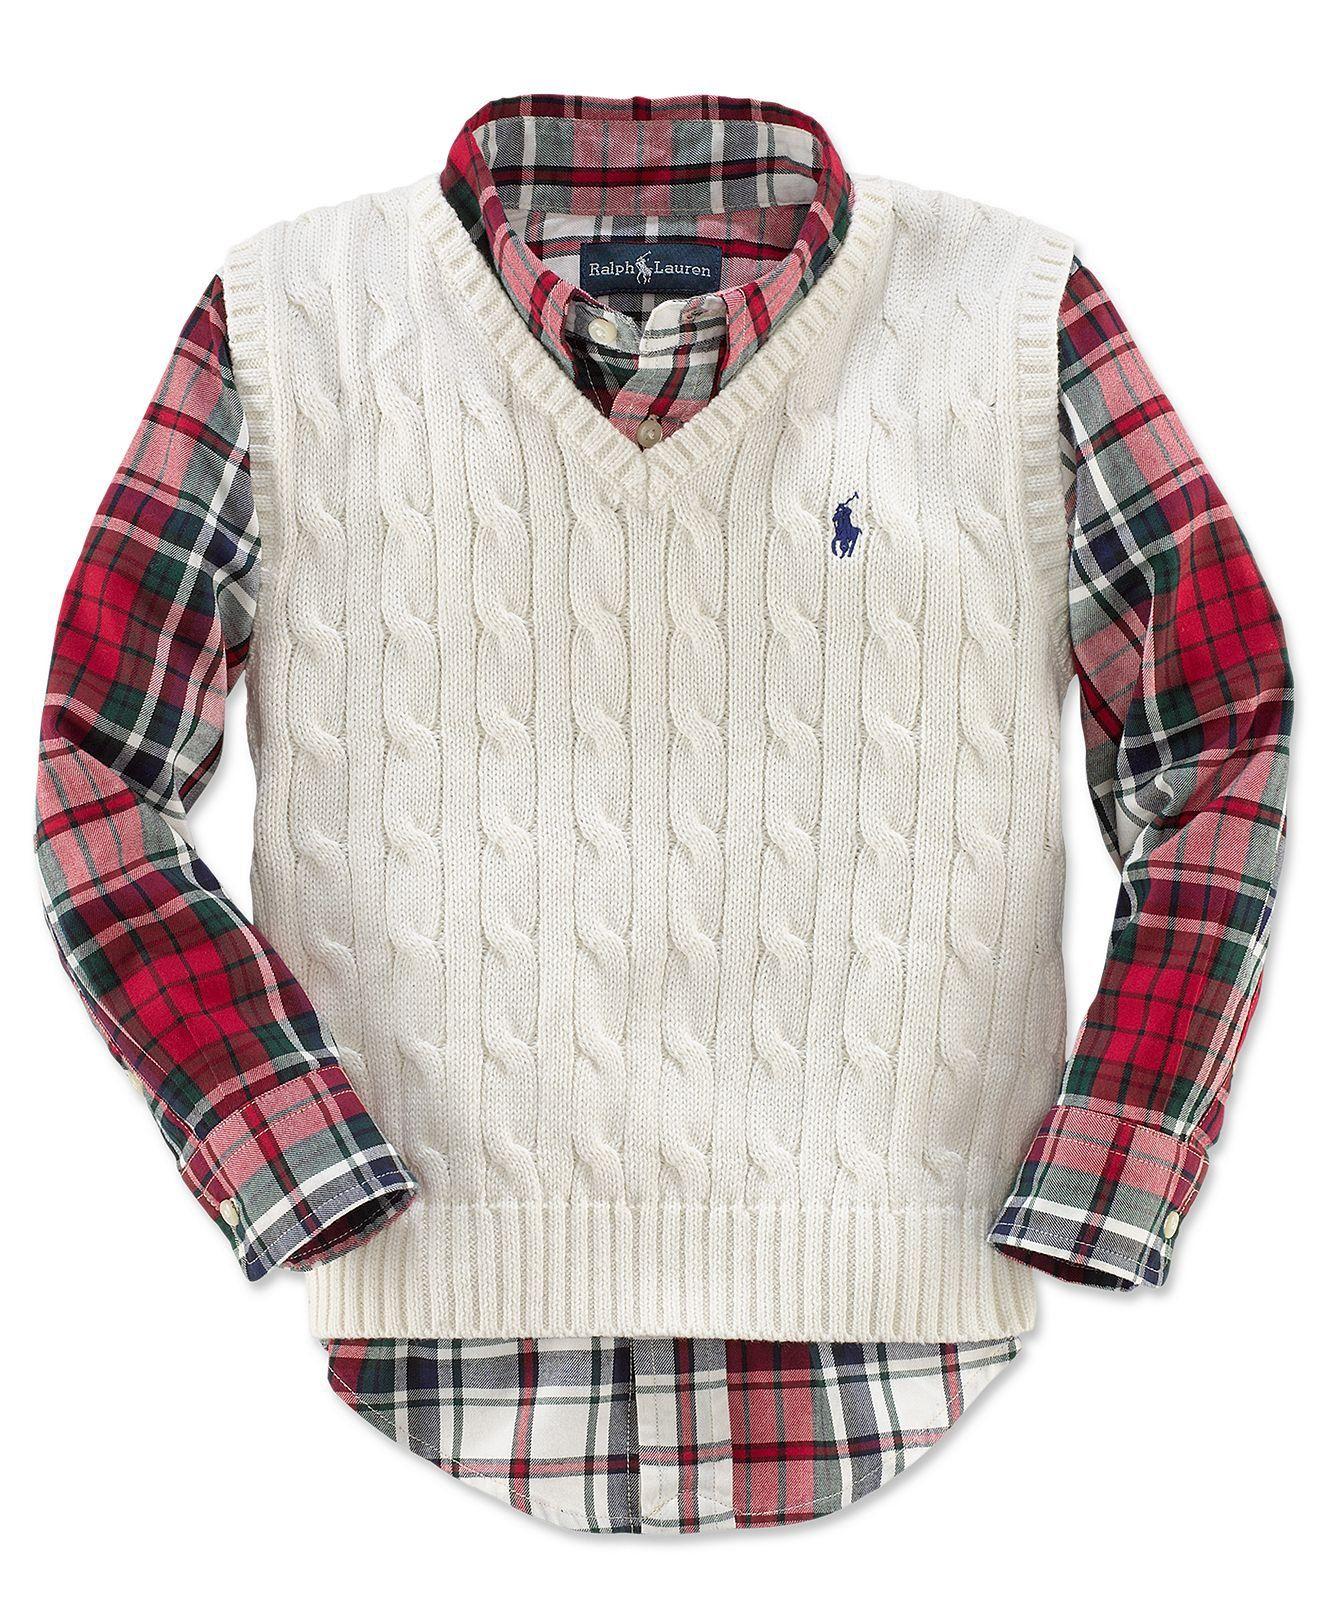 Ralph Lauren Kids Sweater Vest Little Boys Cable Knit Sweater Vest Kids Toddler Boys T T Macys On Wanelo